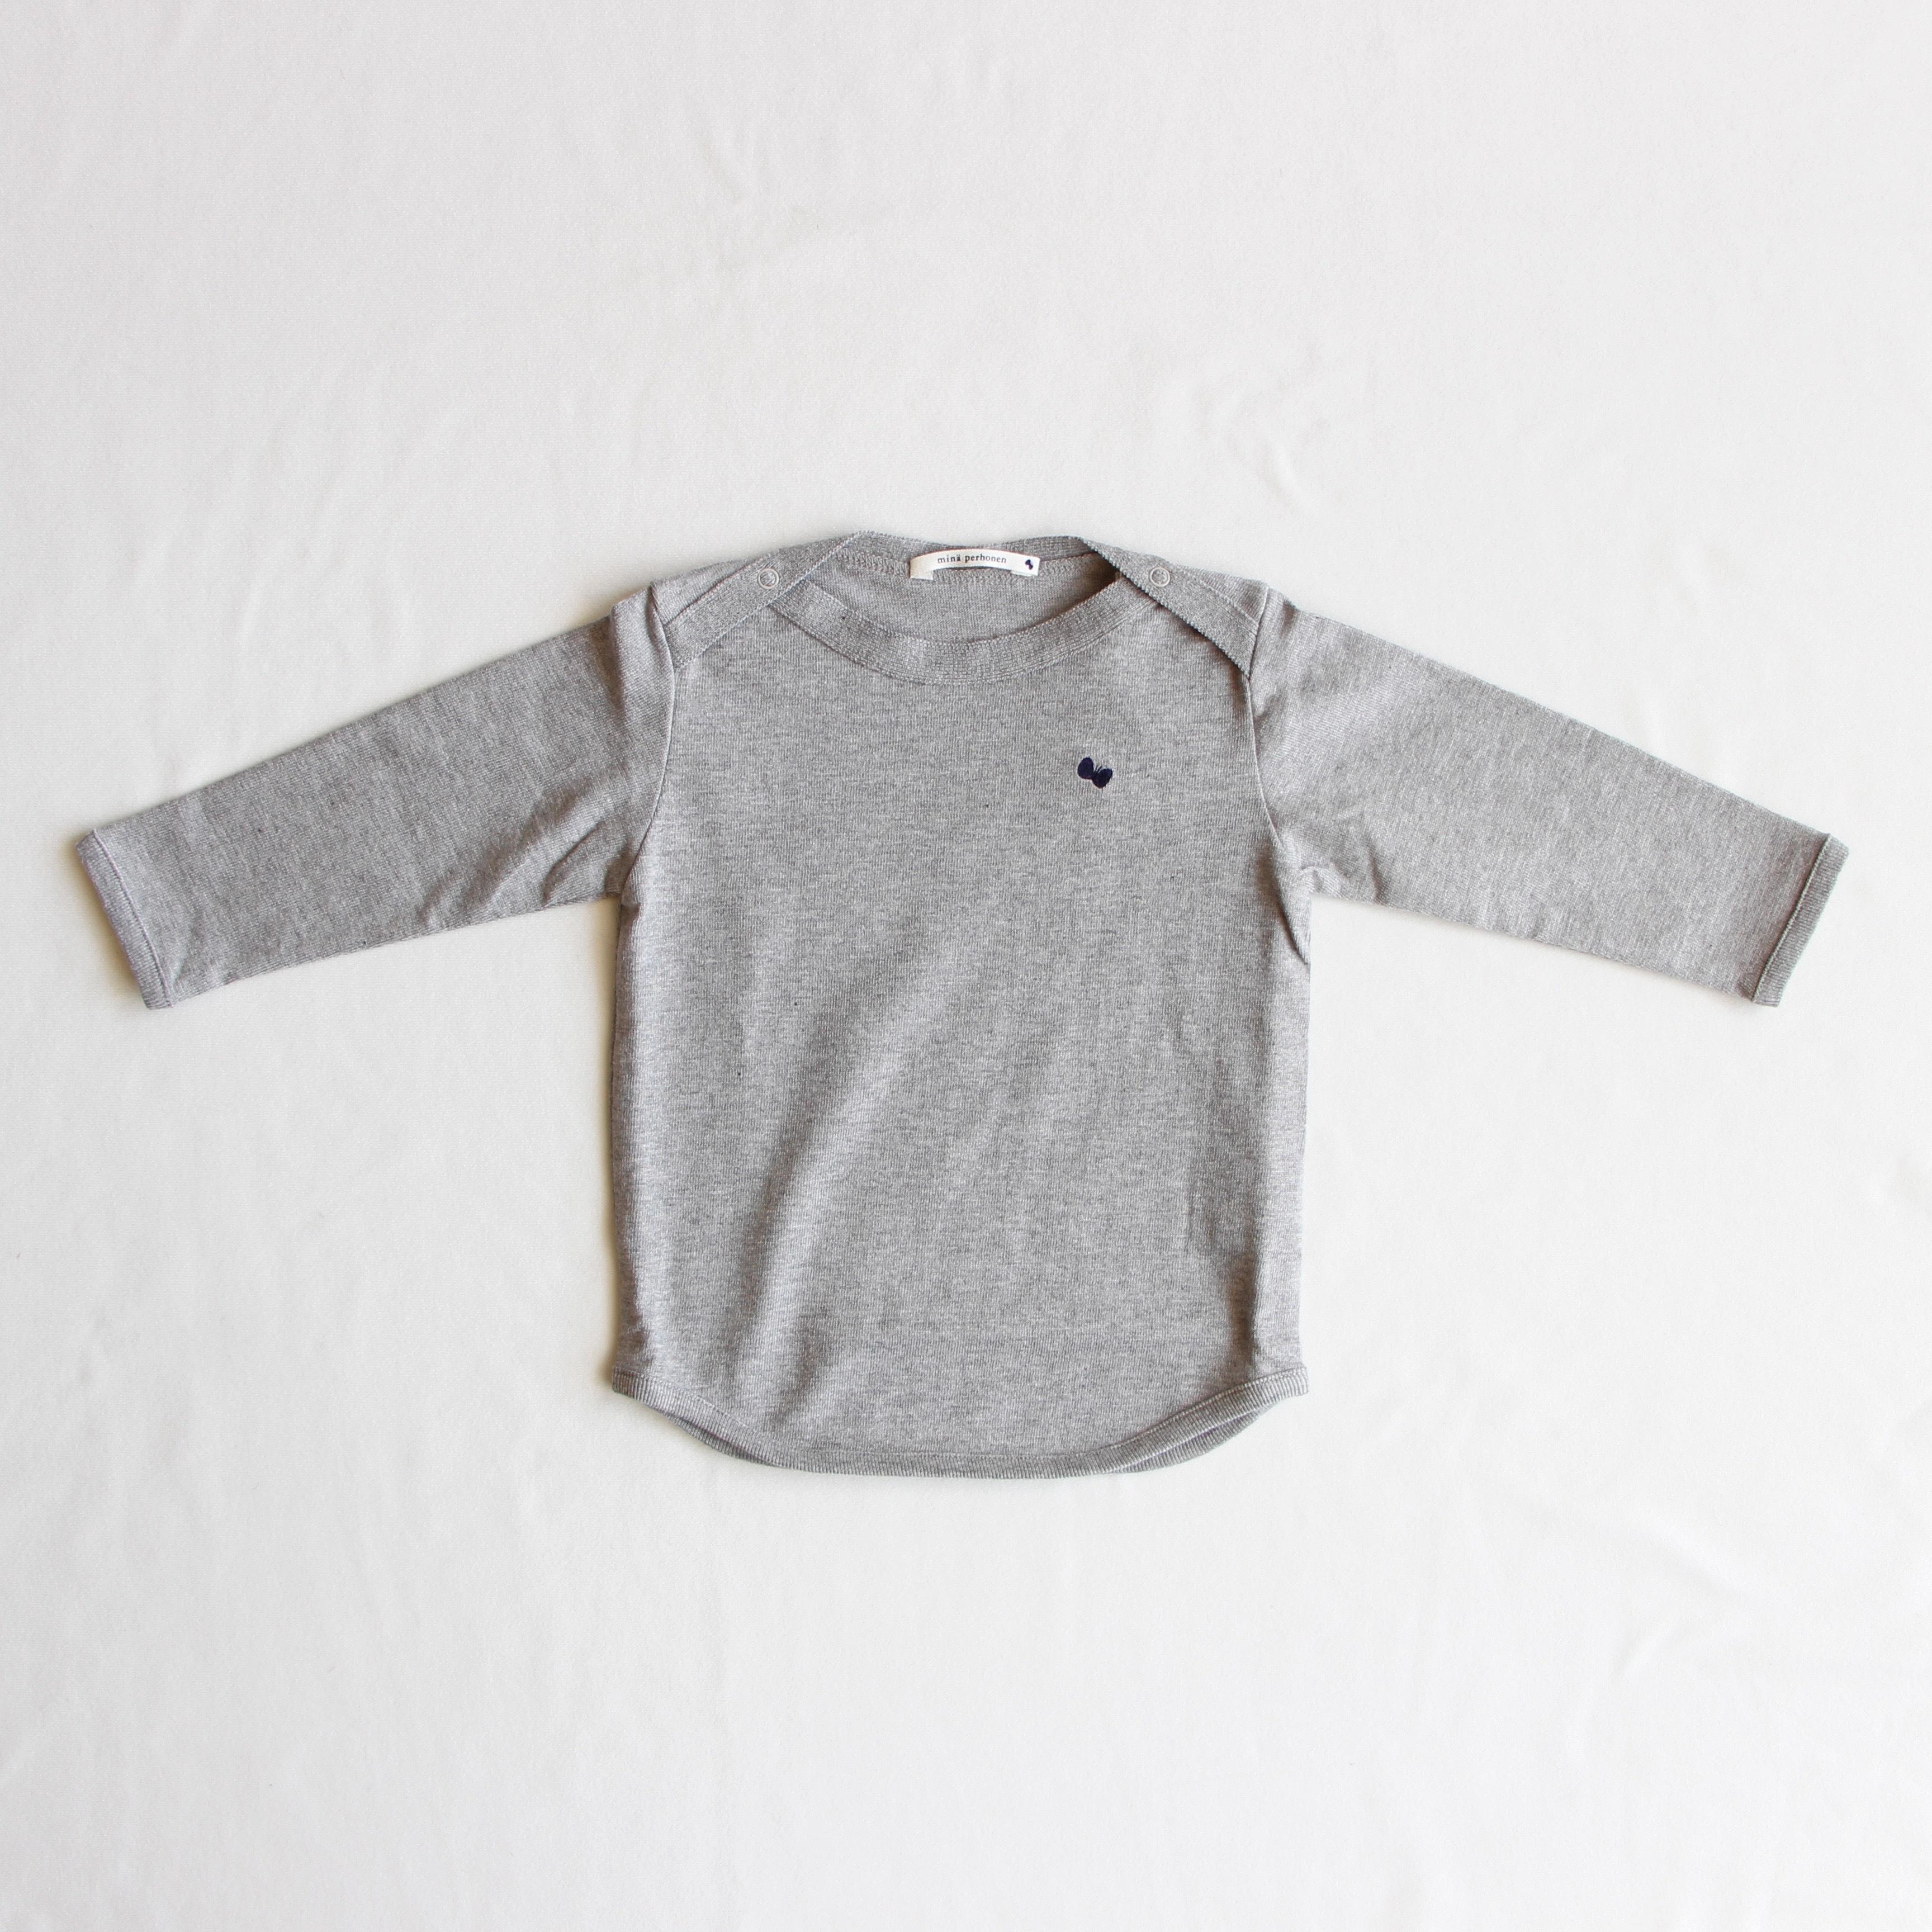 《mina perhonen 2018AW》zutto 長袖カットソー / gray / 110cm